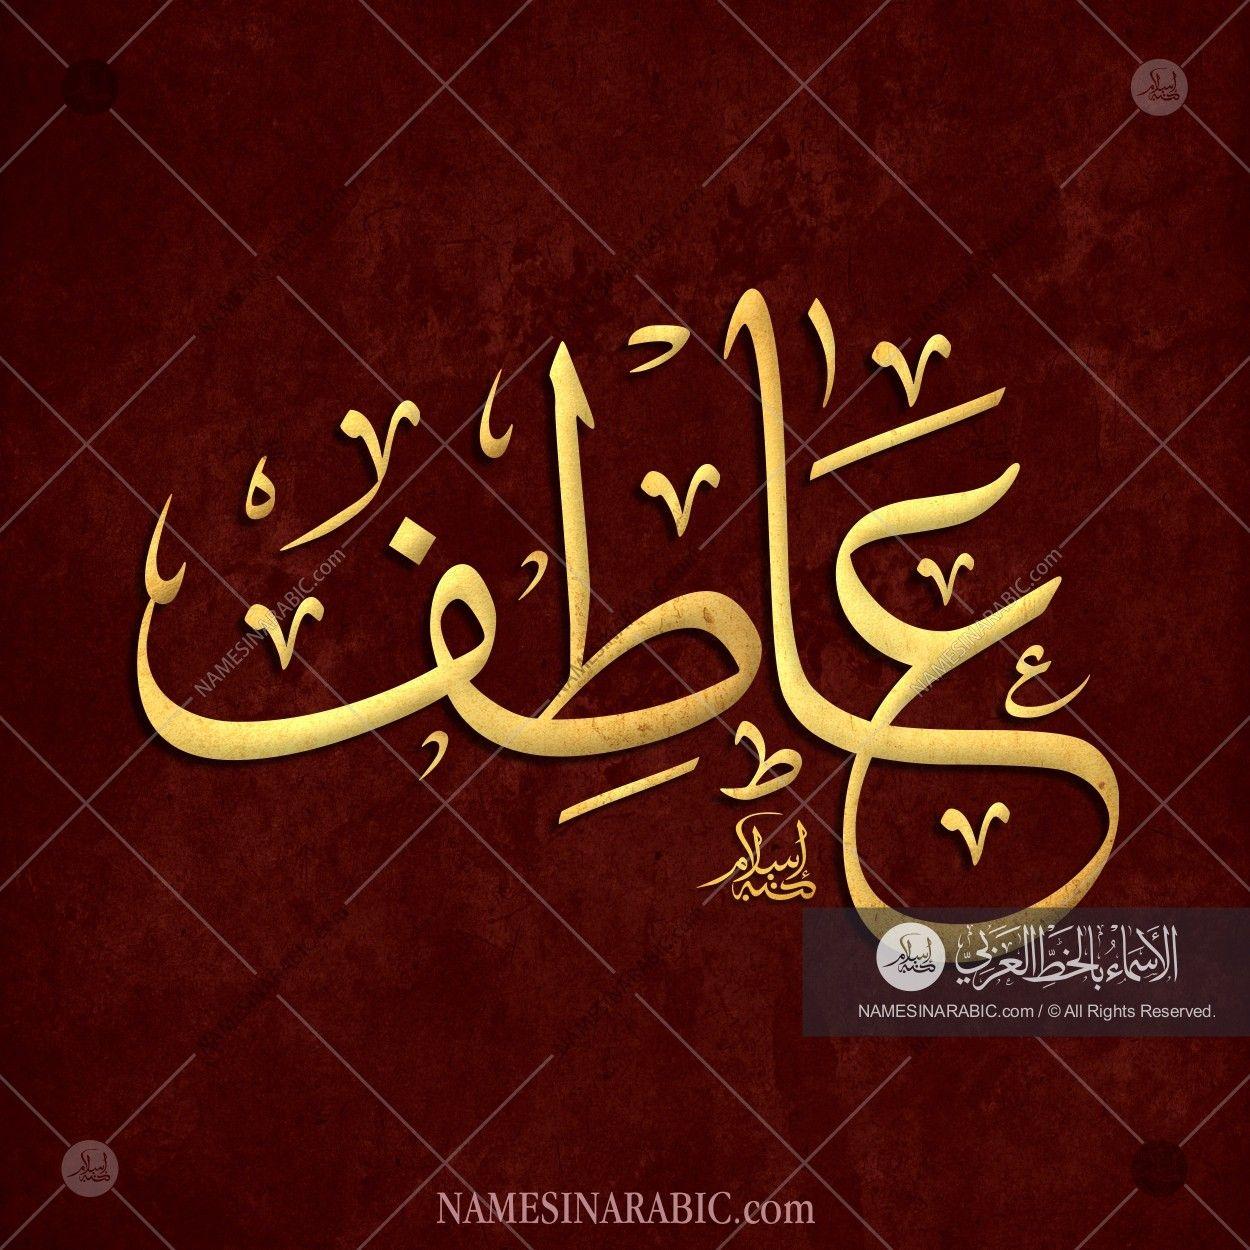 Atif - عاطف / Names in Arabic Calligraphy | Name# 2971